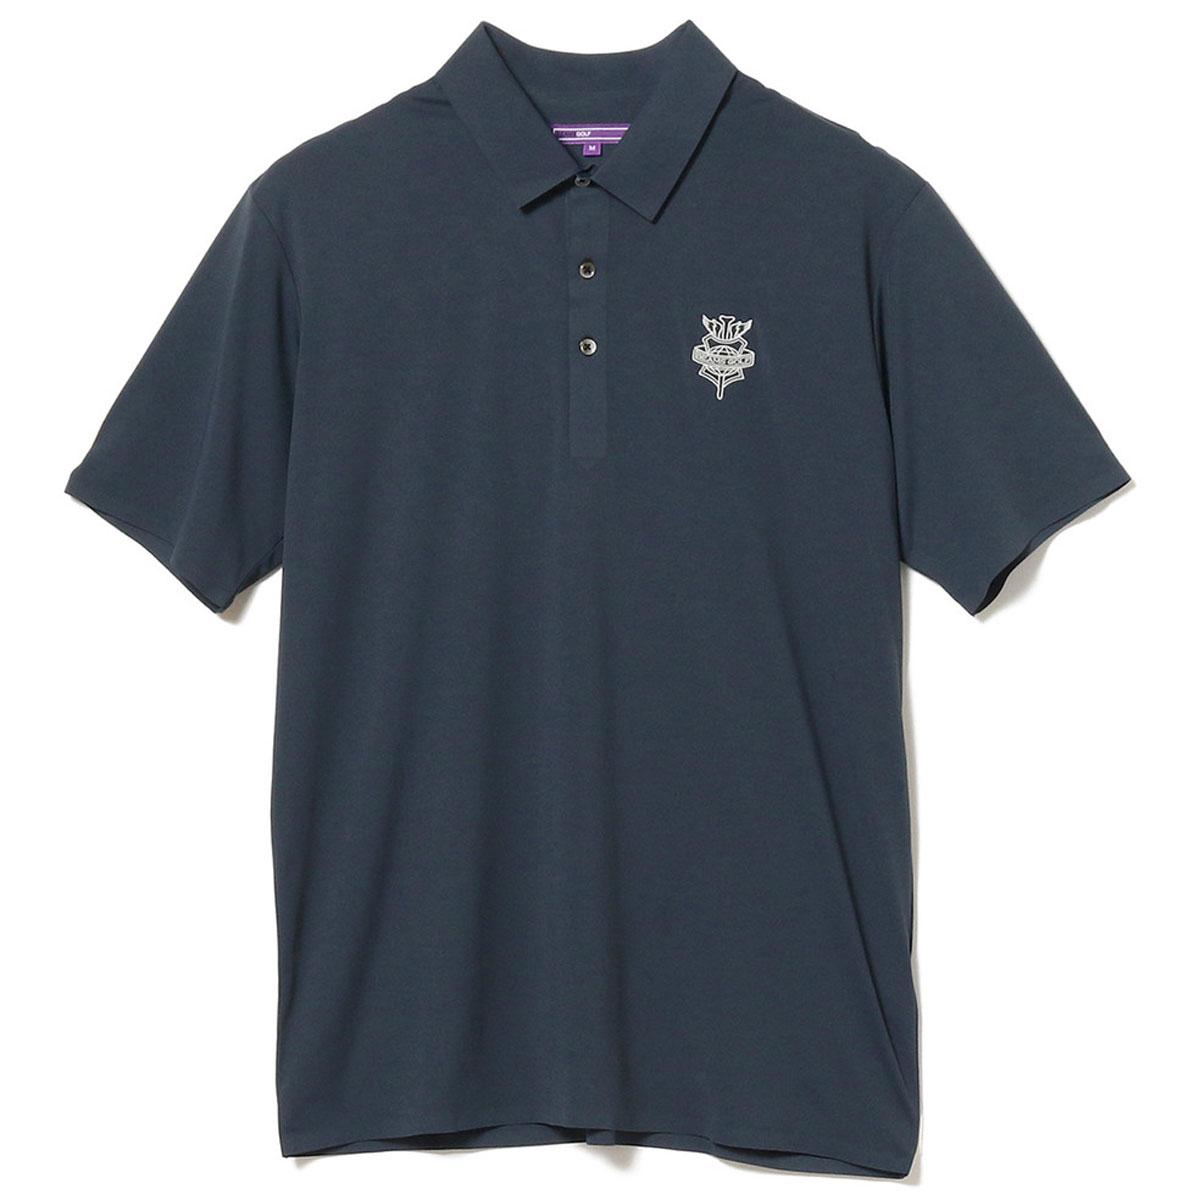 BEAMS GOLF PURPLE LABEL シームレス ポロシャツ